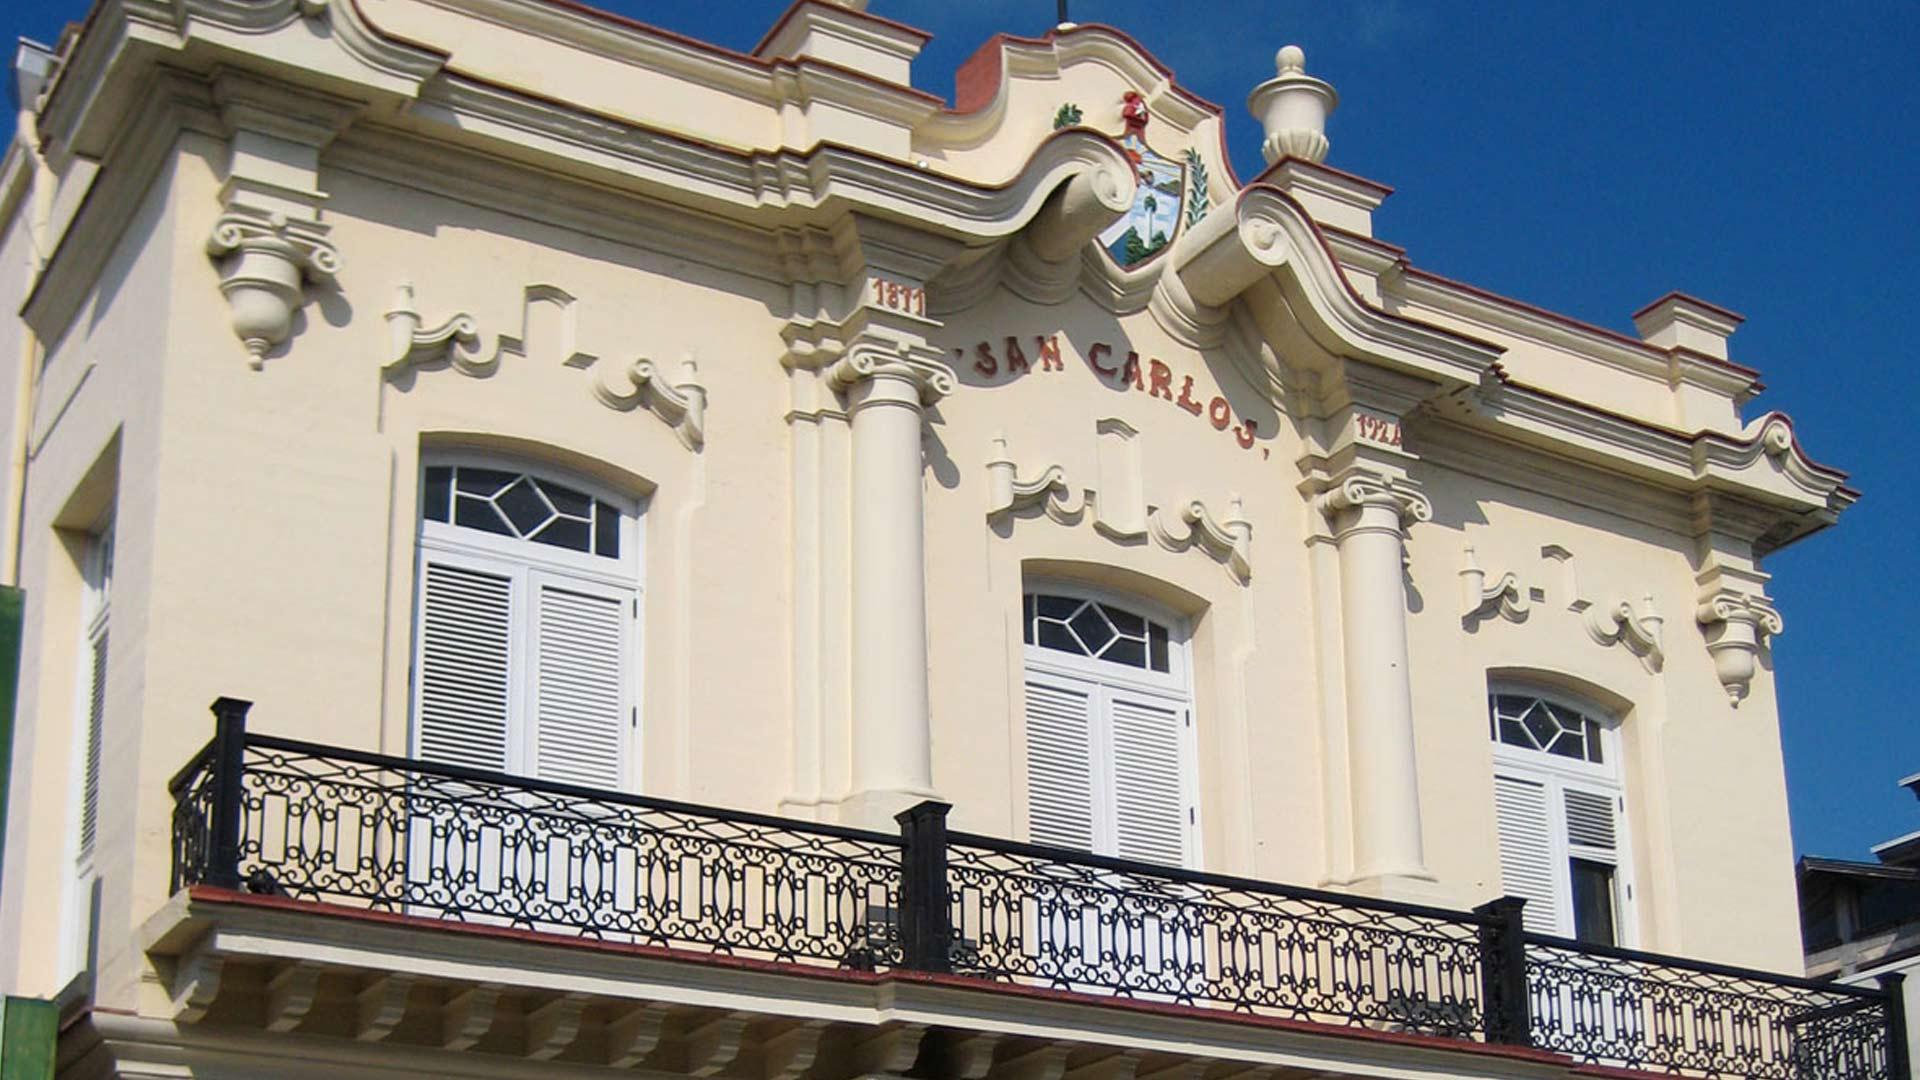 The San Carlos Institute in Key West florida